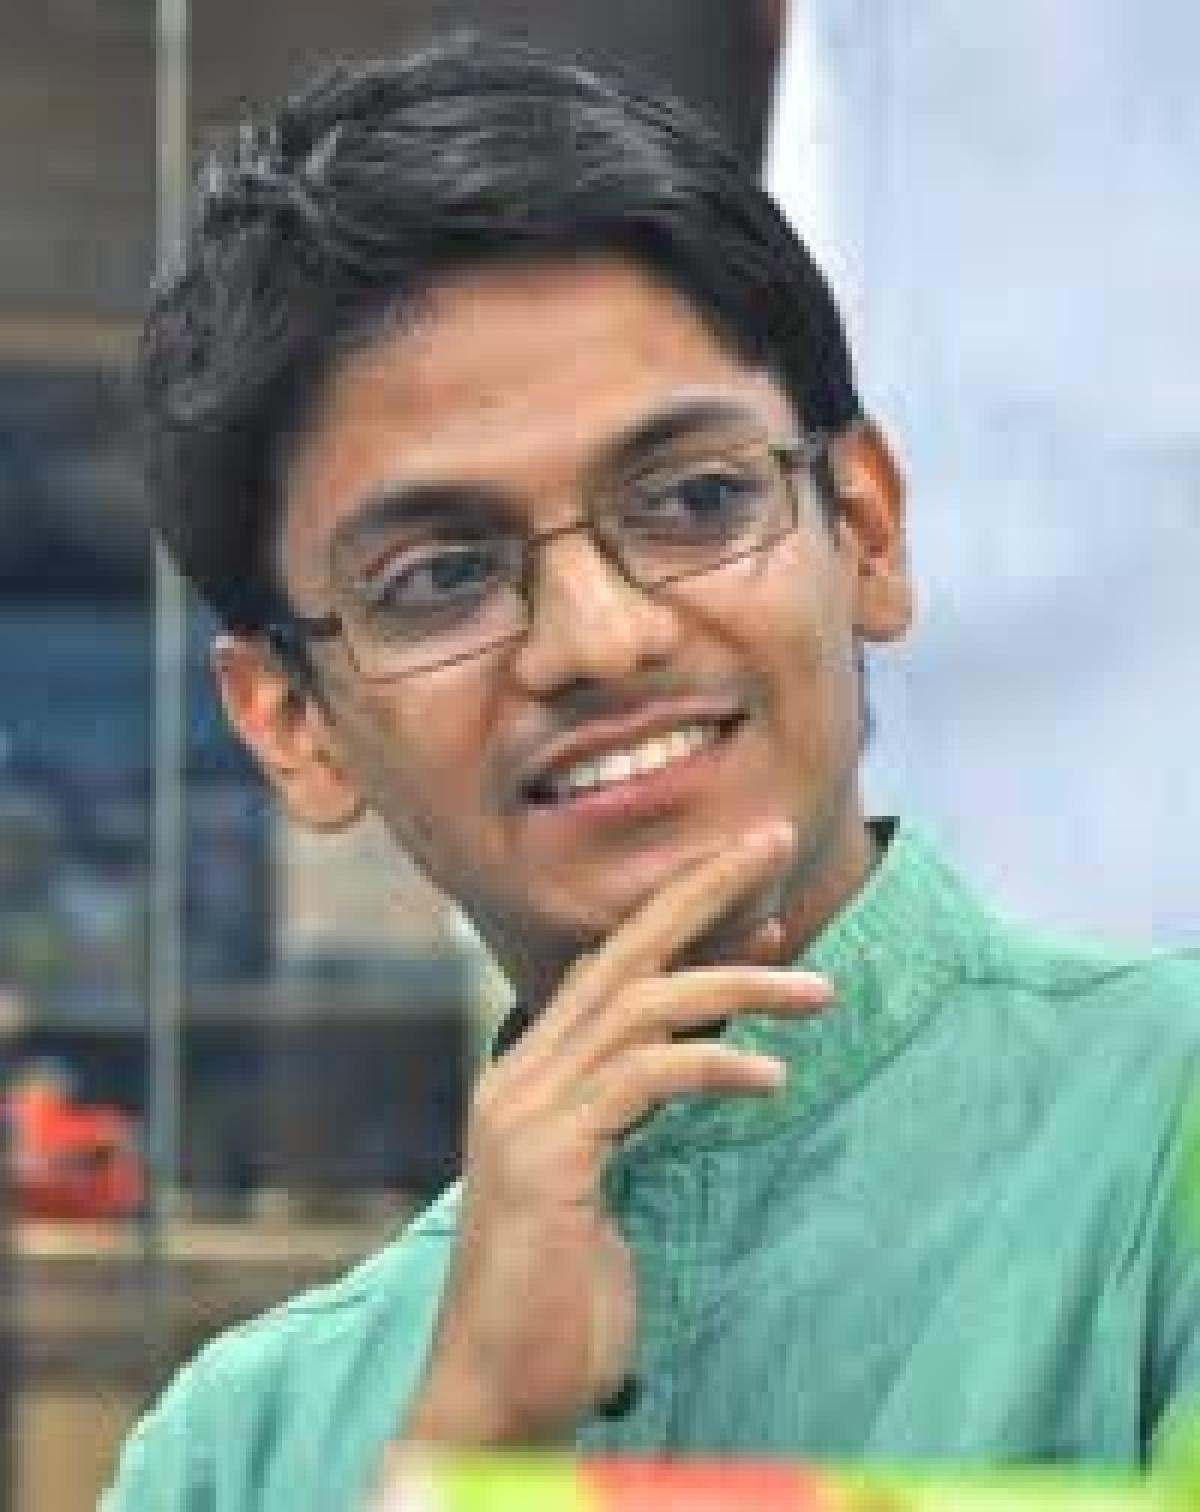 NLSIU grad Aditya Sudarshan wins the MetroPlus Playwright Award 2011